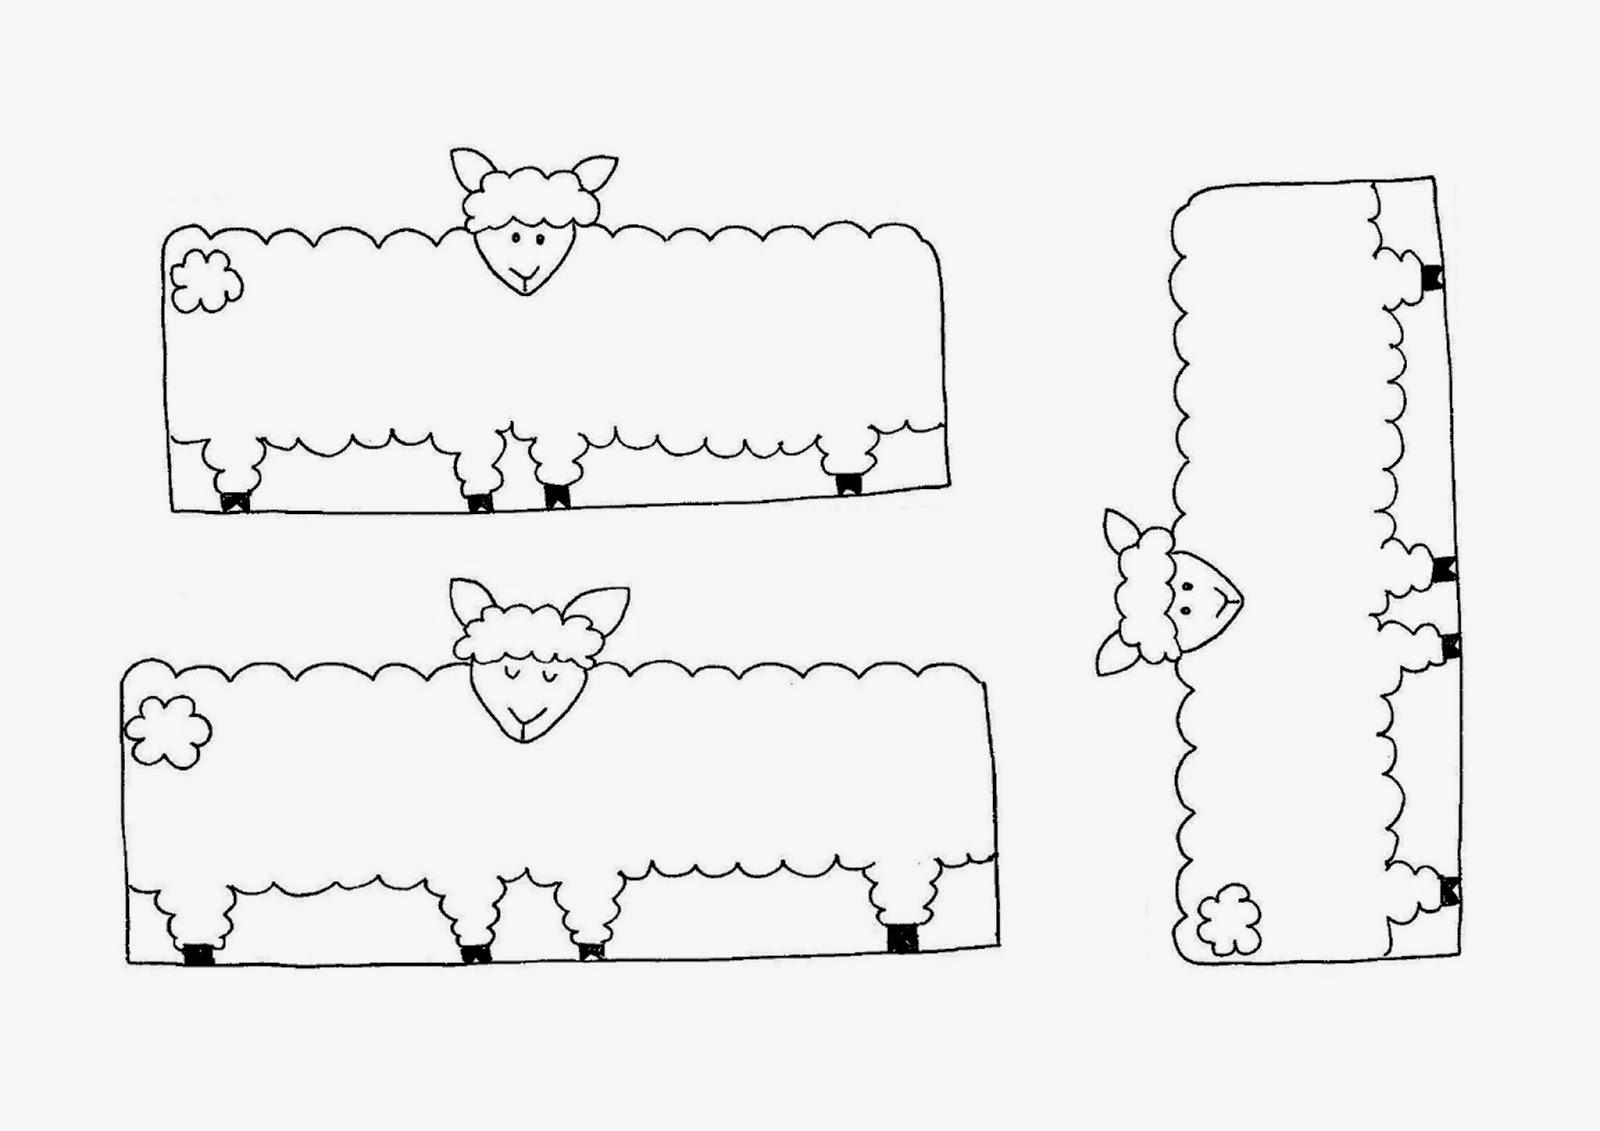 Gambar domba dipotong sesuai bentuk lalu gulung dan tempel gambar domba tsb lihat contoh gambar jadinya diatas